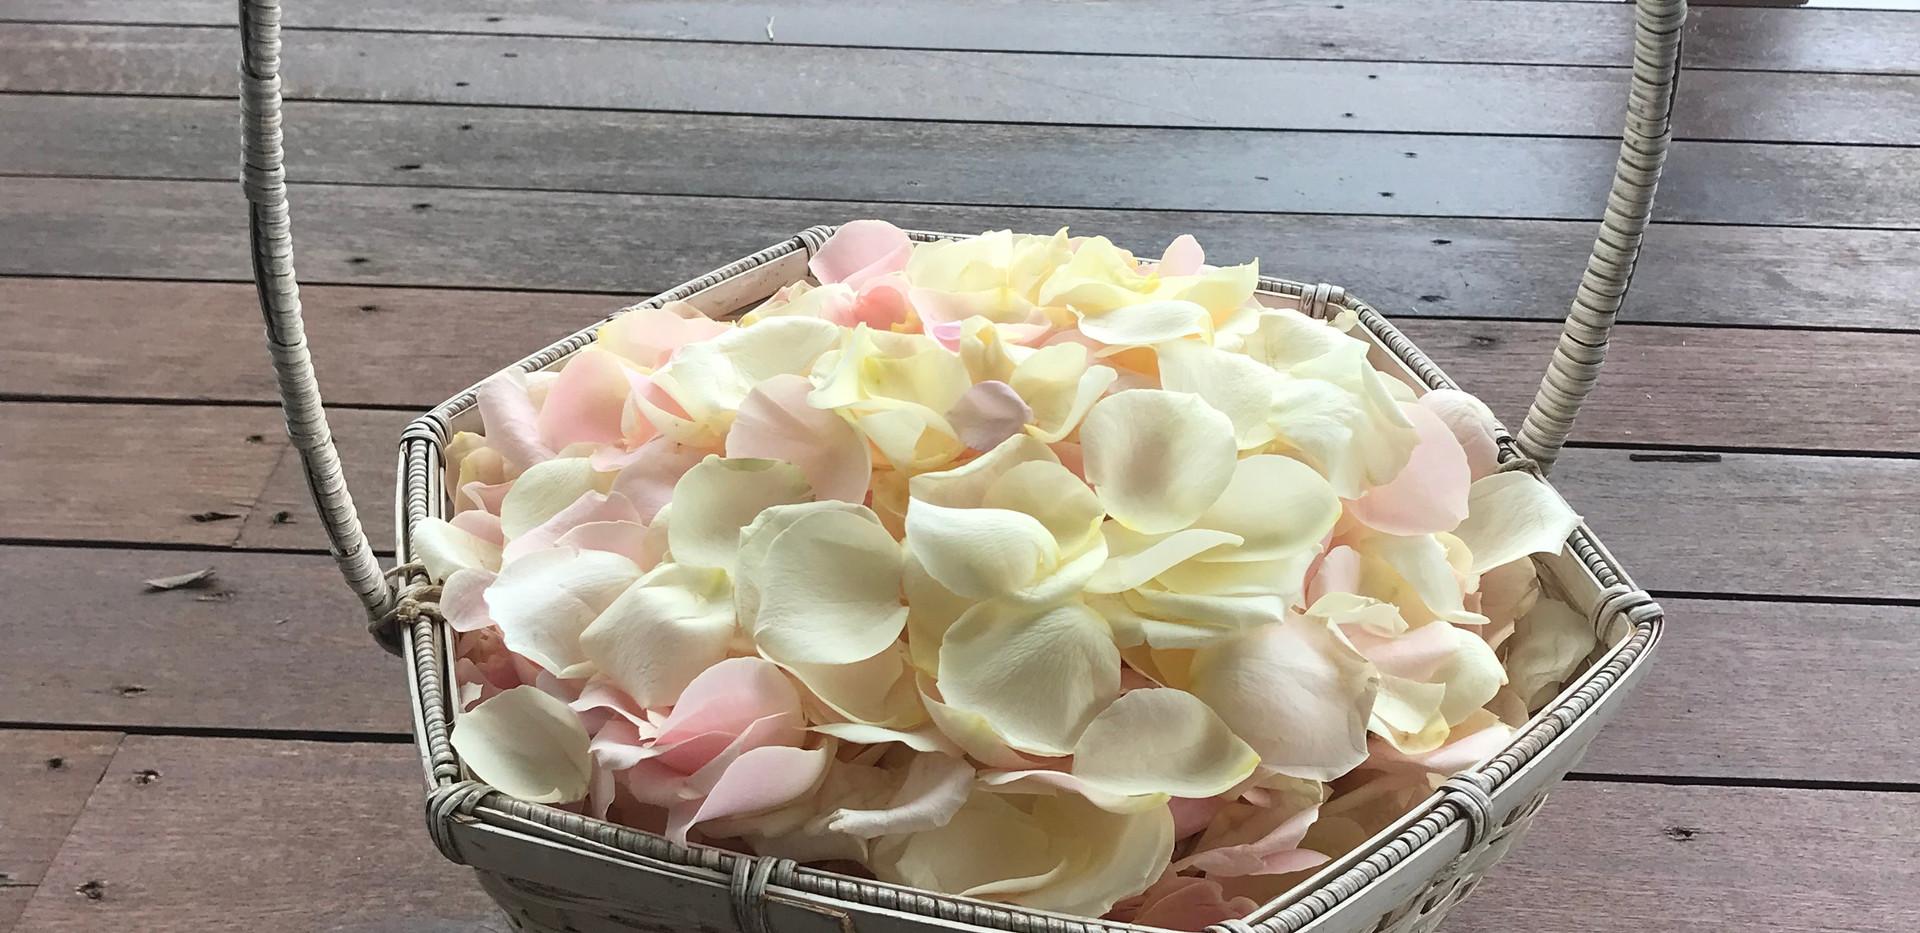 Rose petal aisle sunshine coast